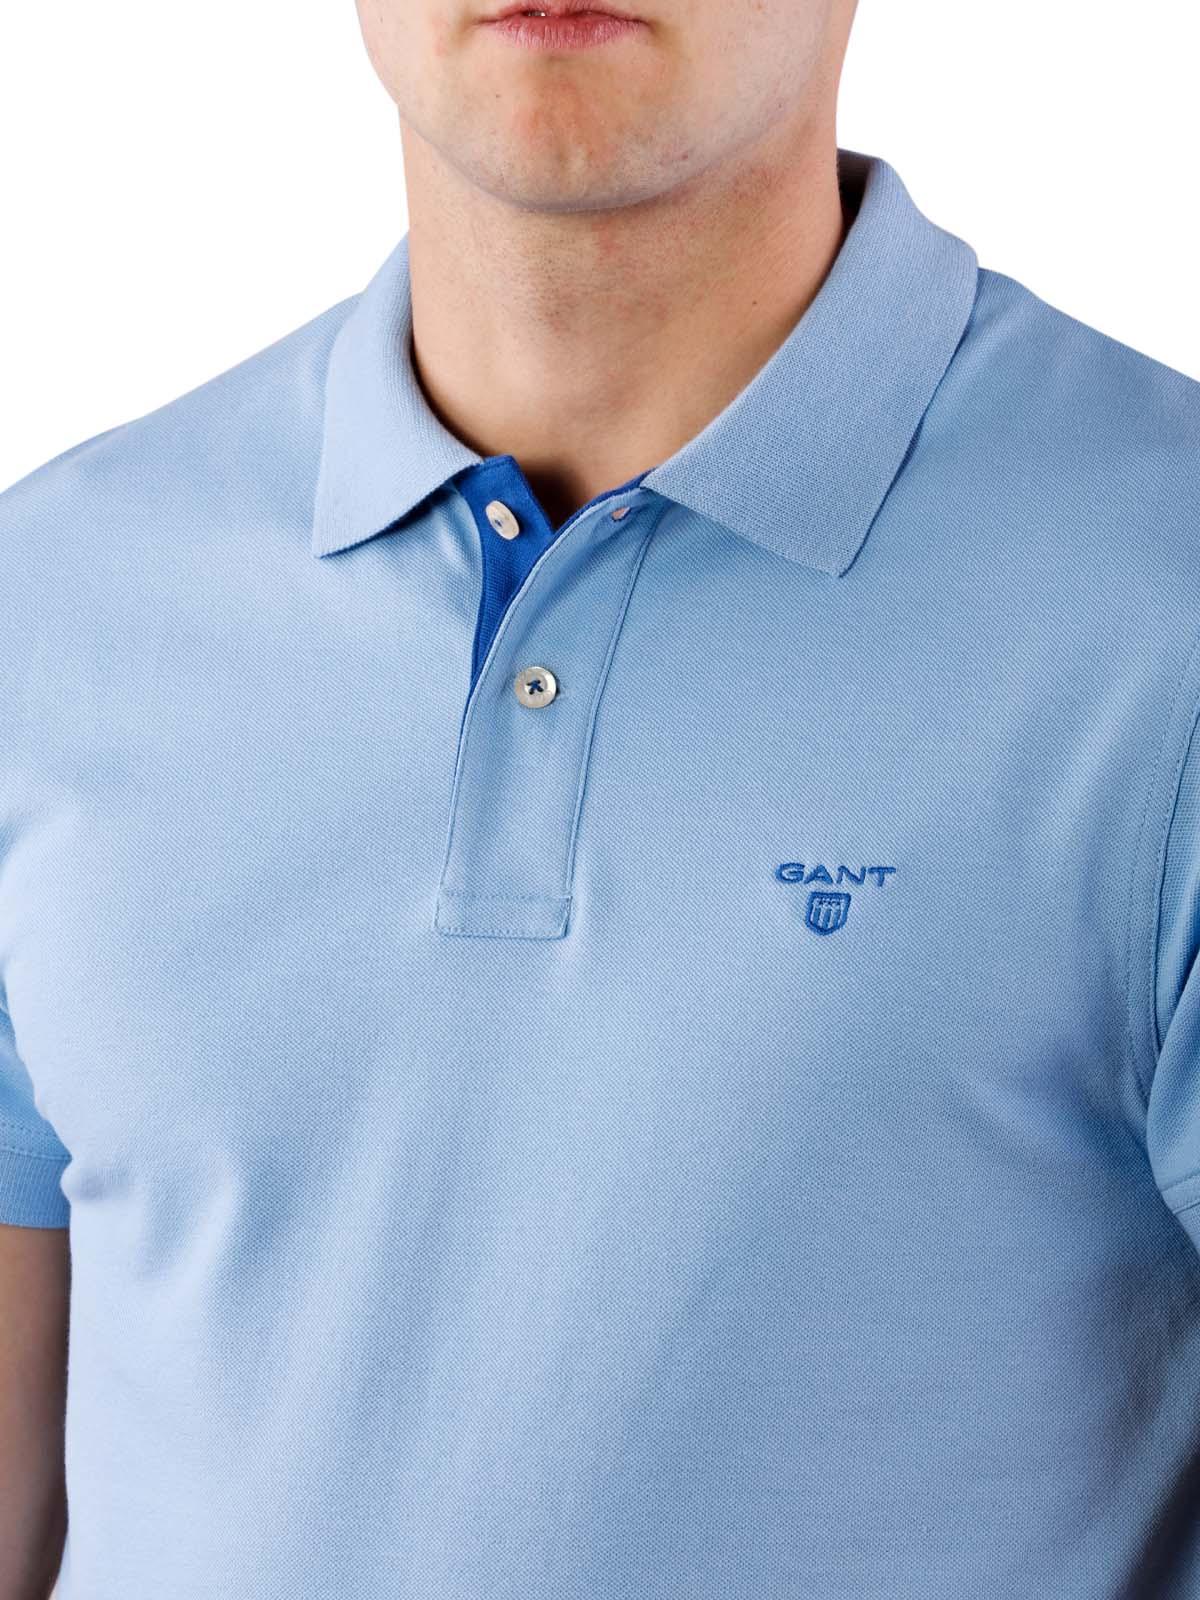 new style 107f8 abb82 Gant Contrast Collar Piqué SS Rugger capri blue